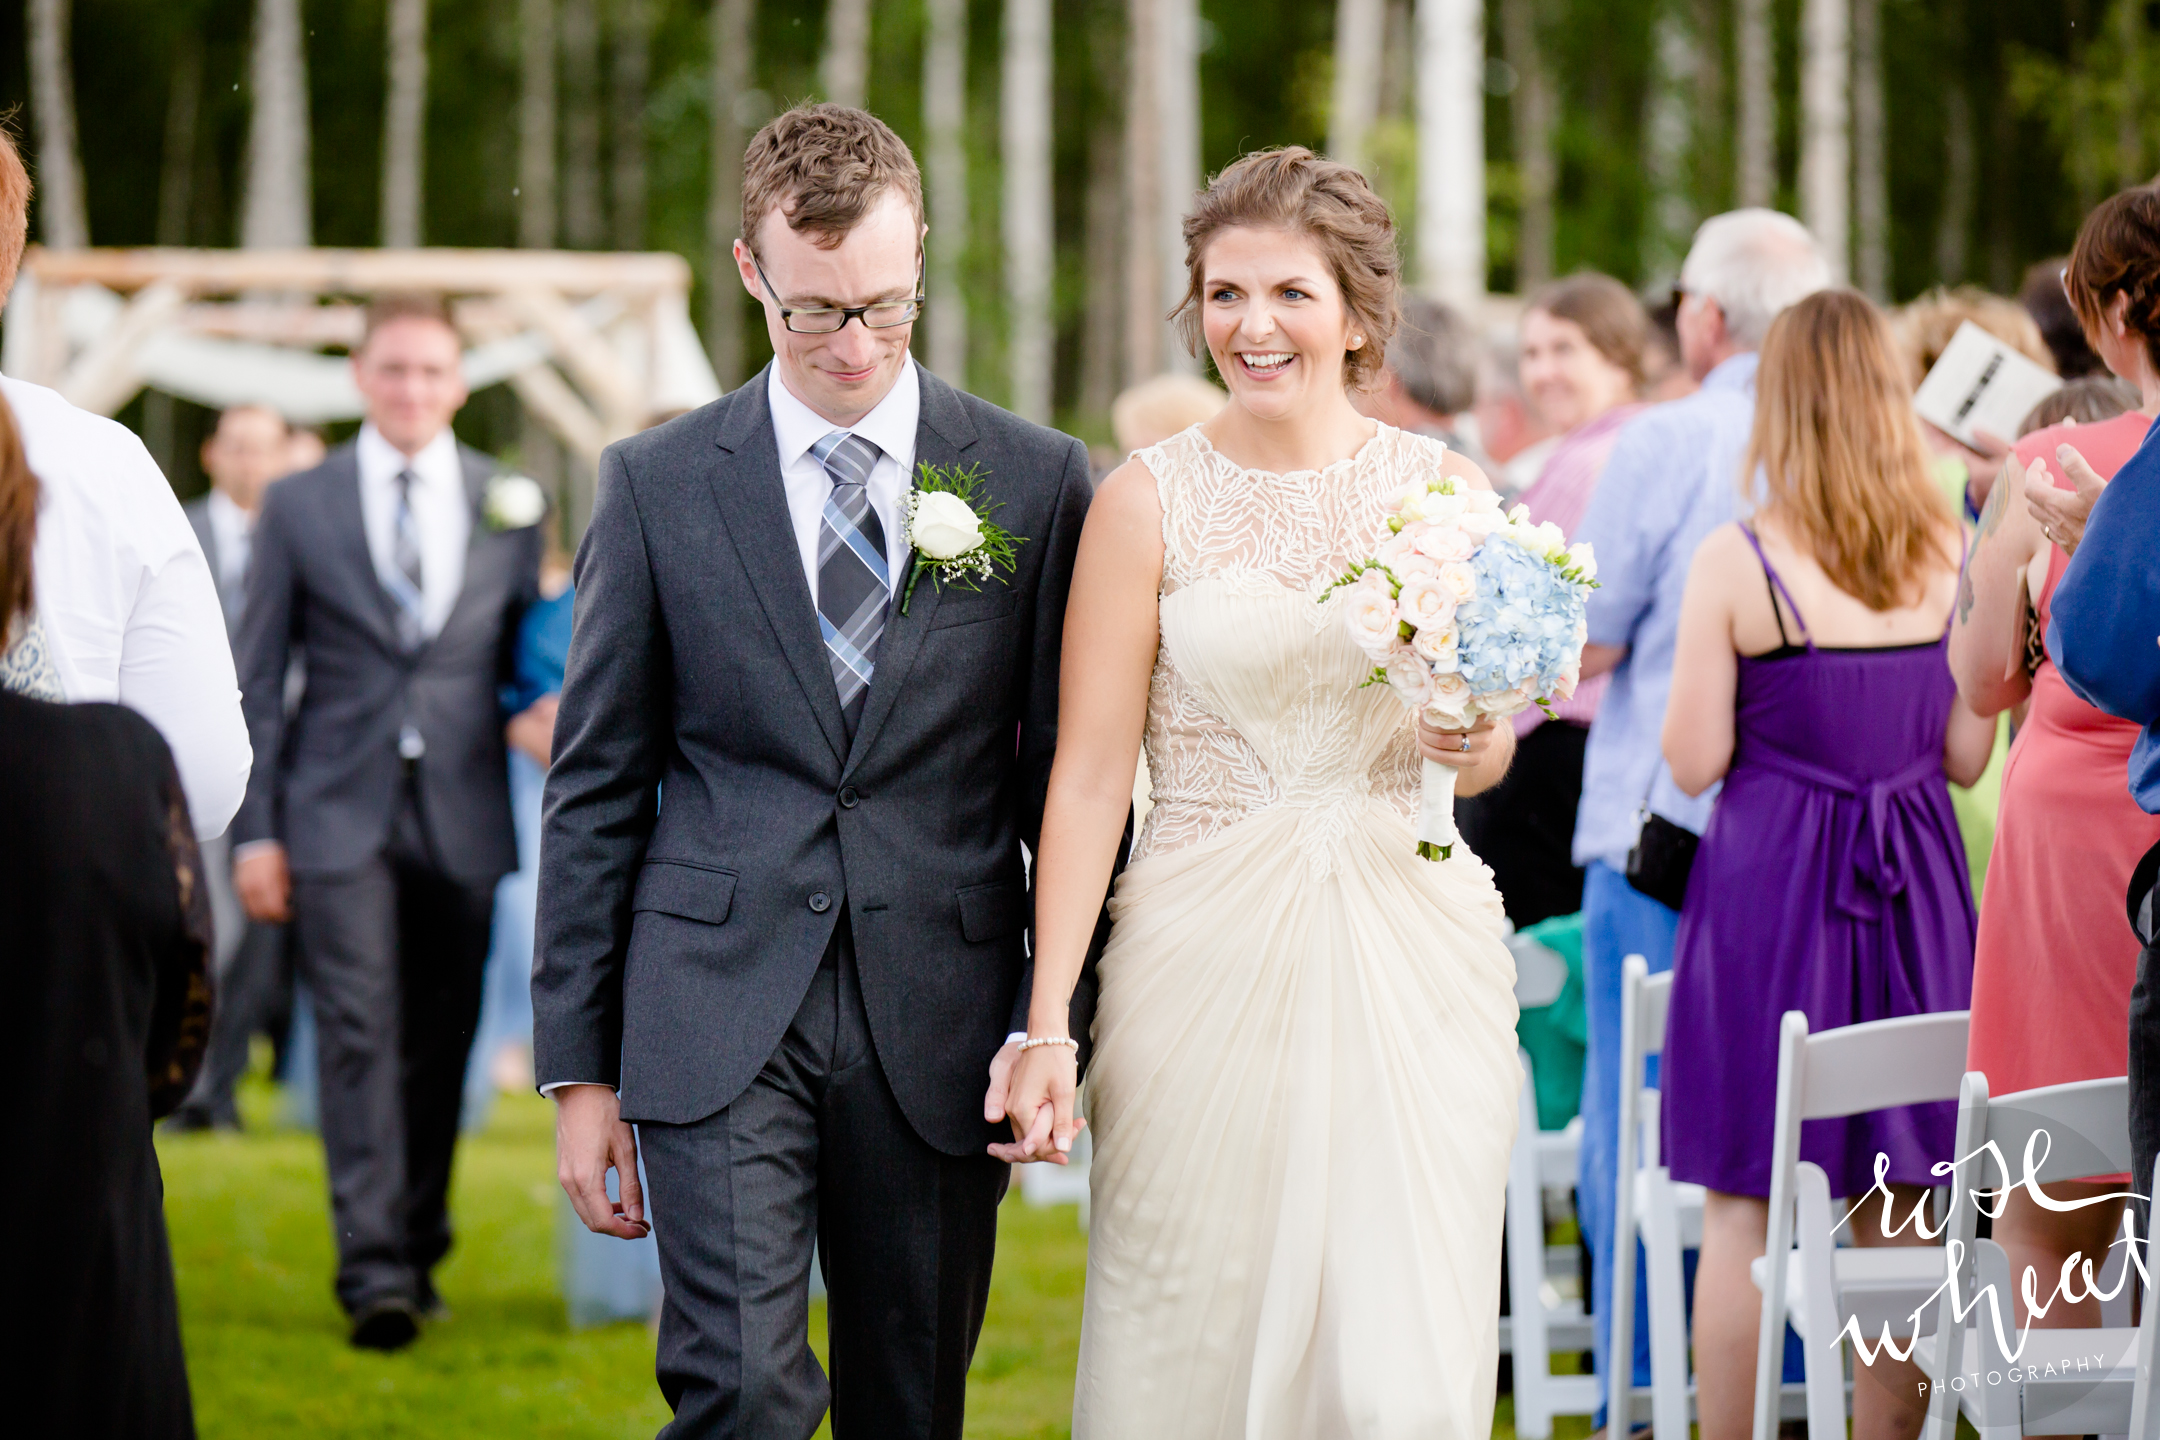 12. Birch_Hill_Fairbanks_Ak_Wedding_Rose_Wheat_Photogrpahy-1.jpg-18.jpg